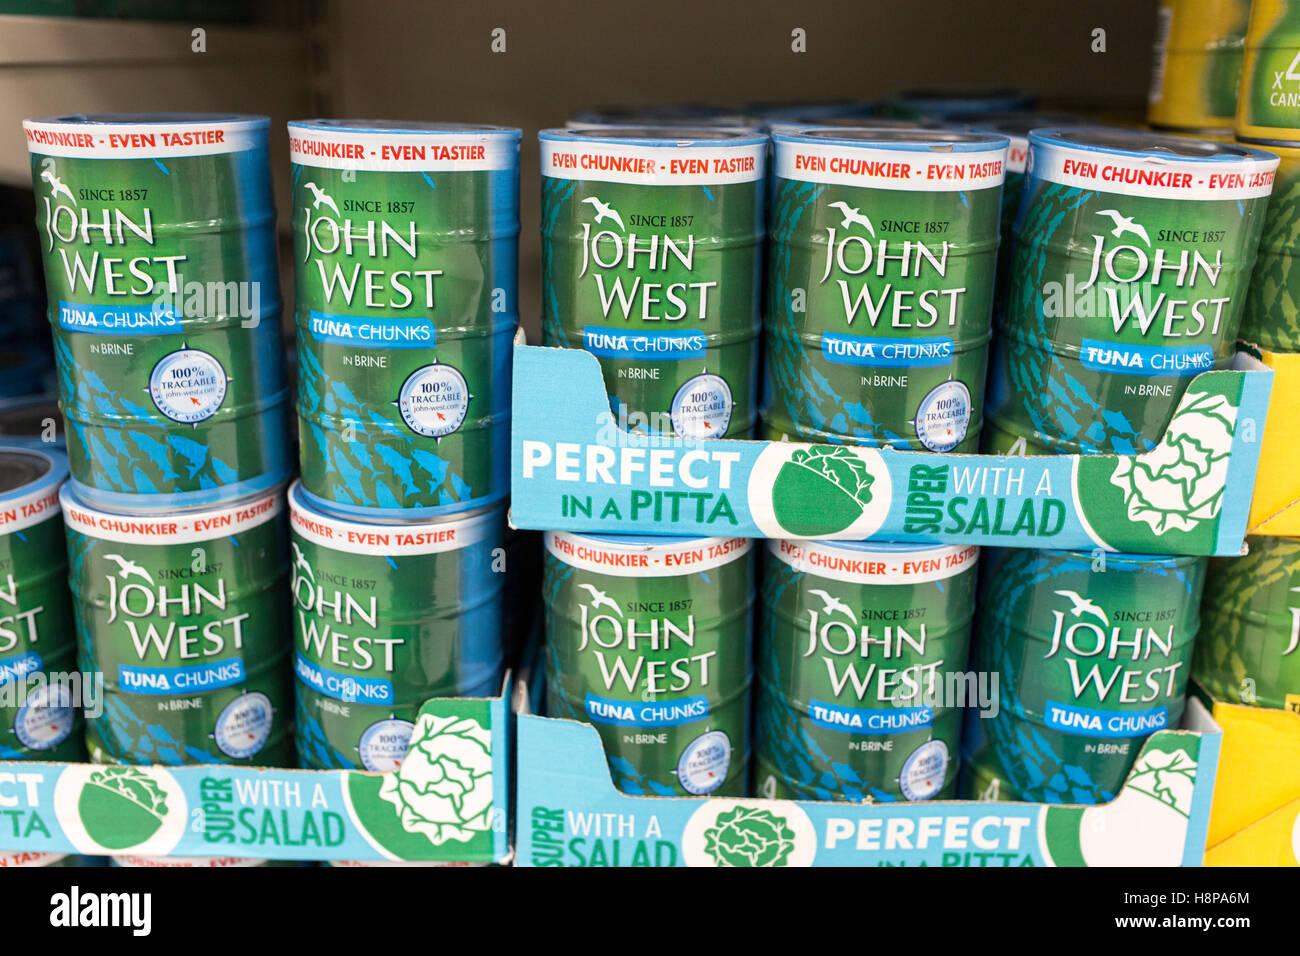 tins of John West tuna on supermarket shelves - Stock Image